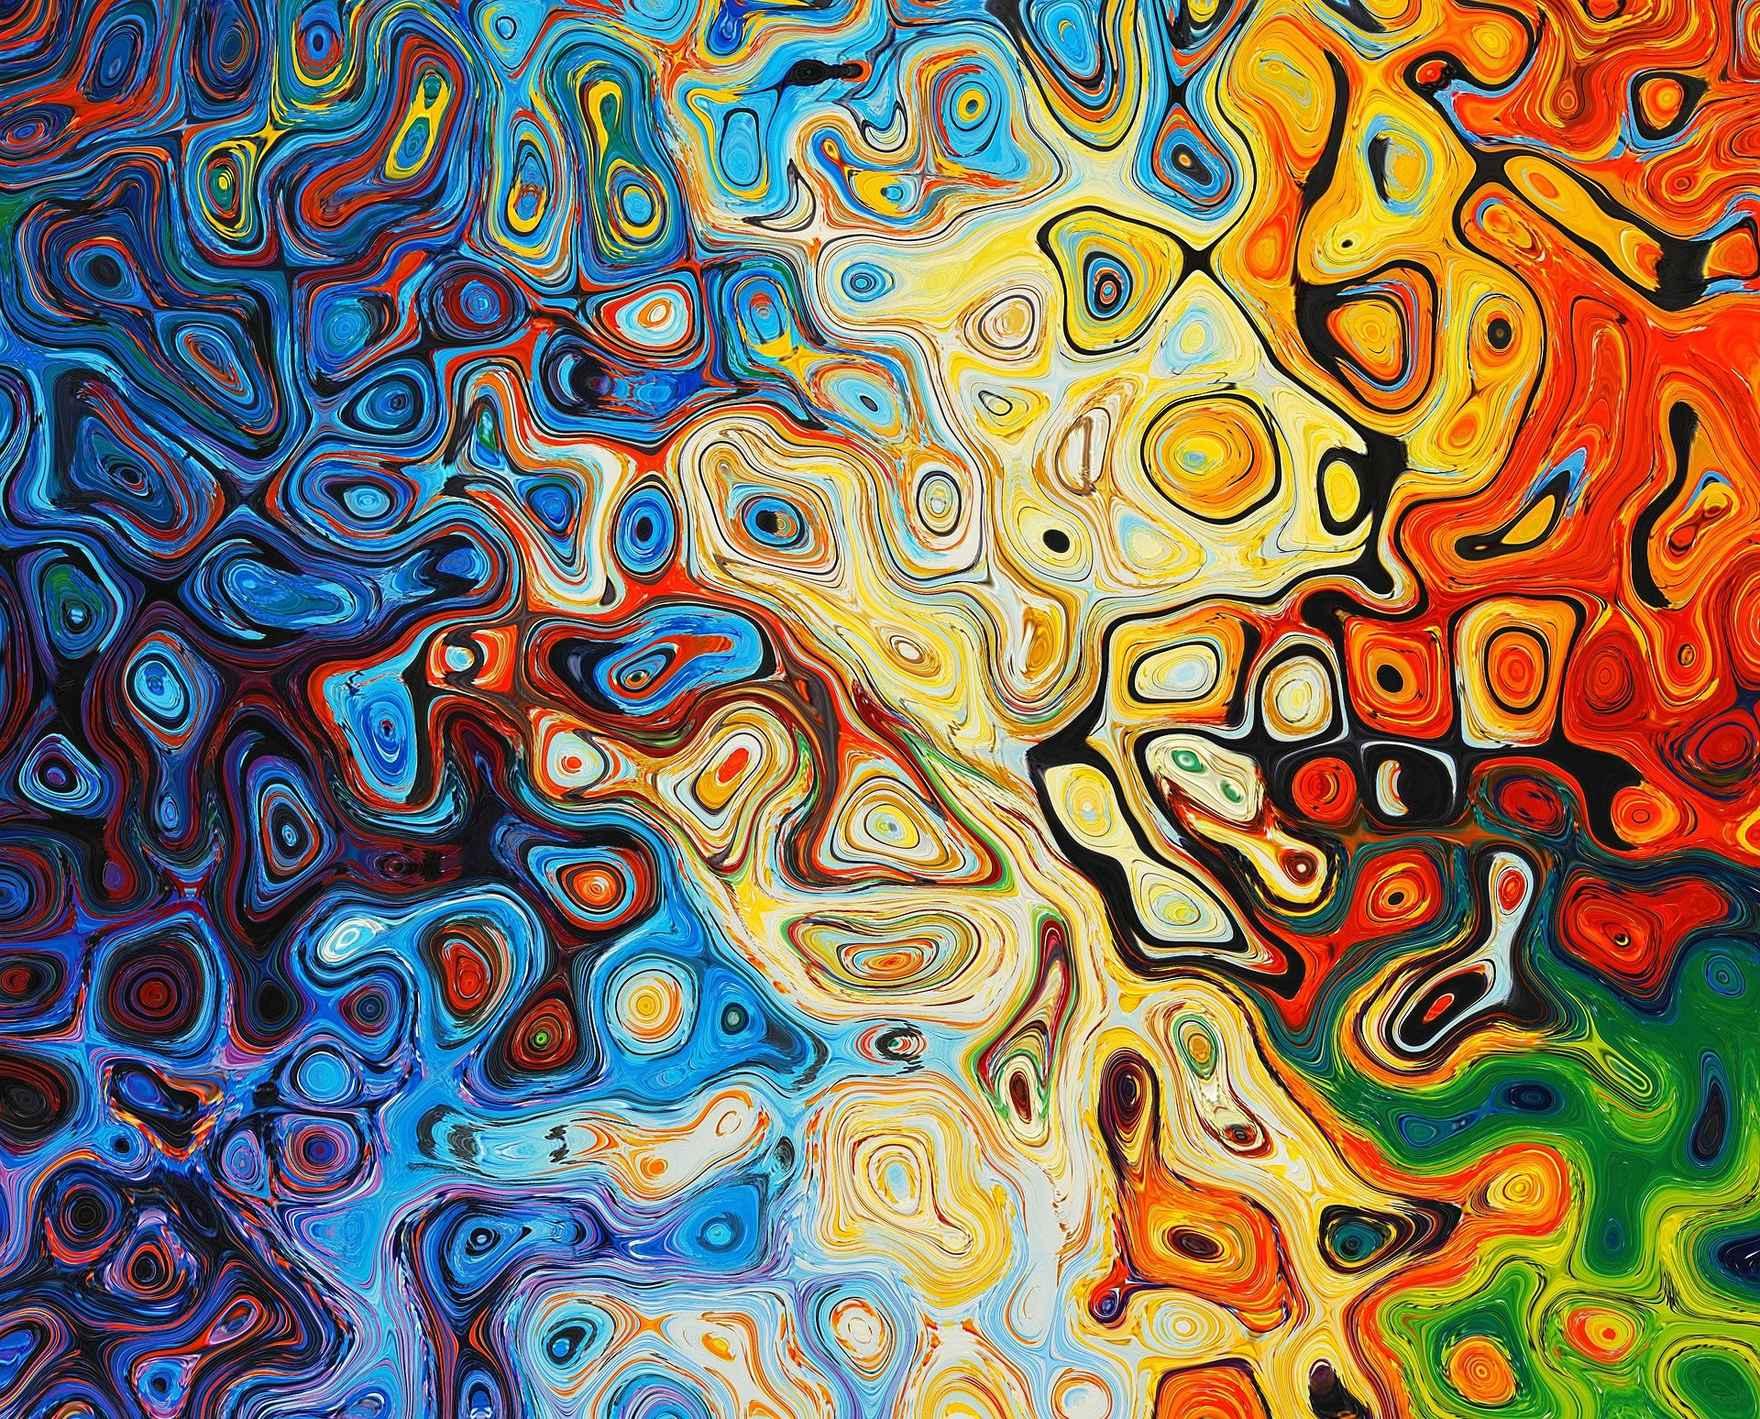 warpy-dali-painting